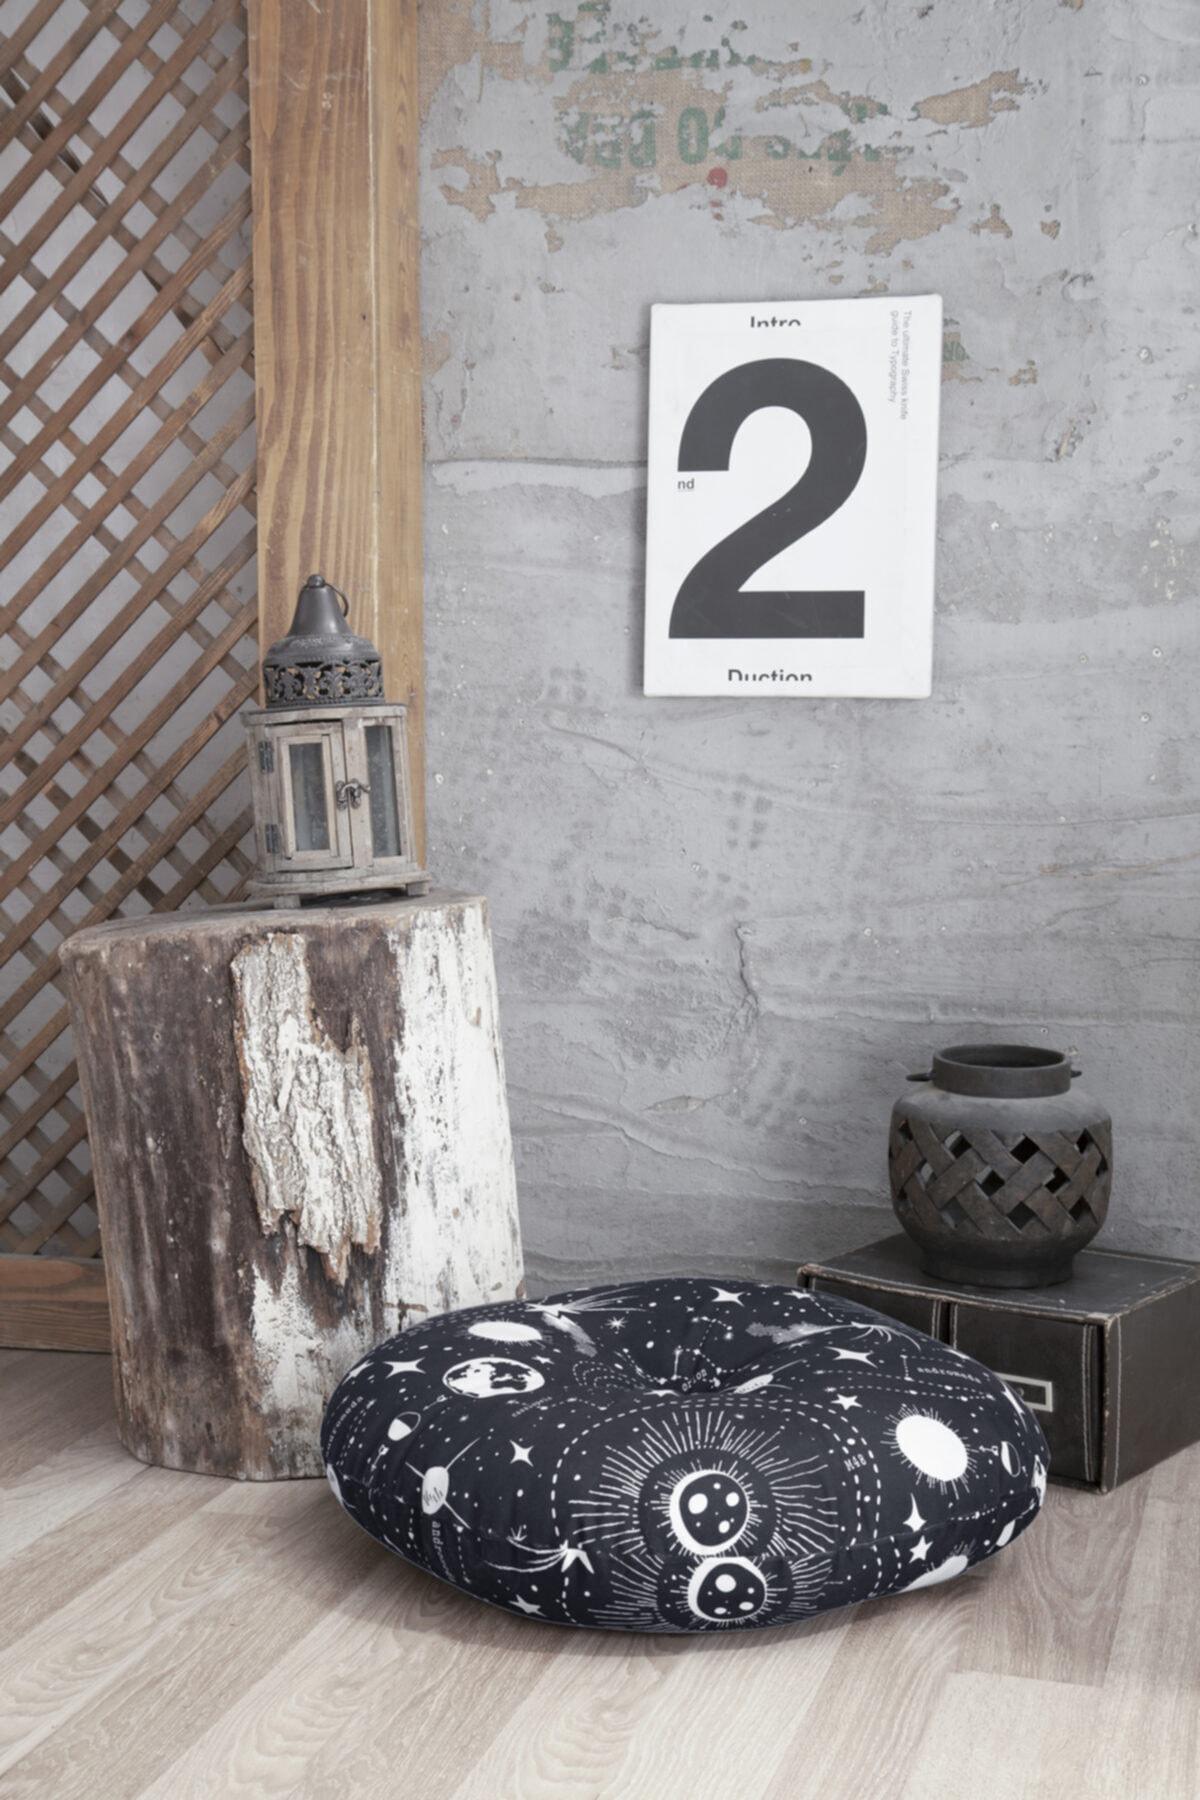 Home&Bath Dekoratif Yer Minderi Andromeda 2